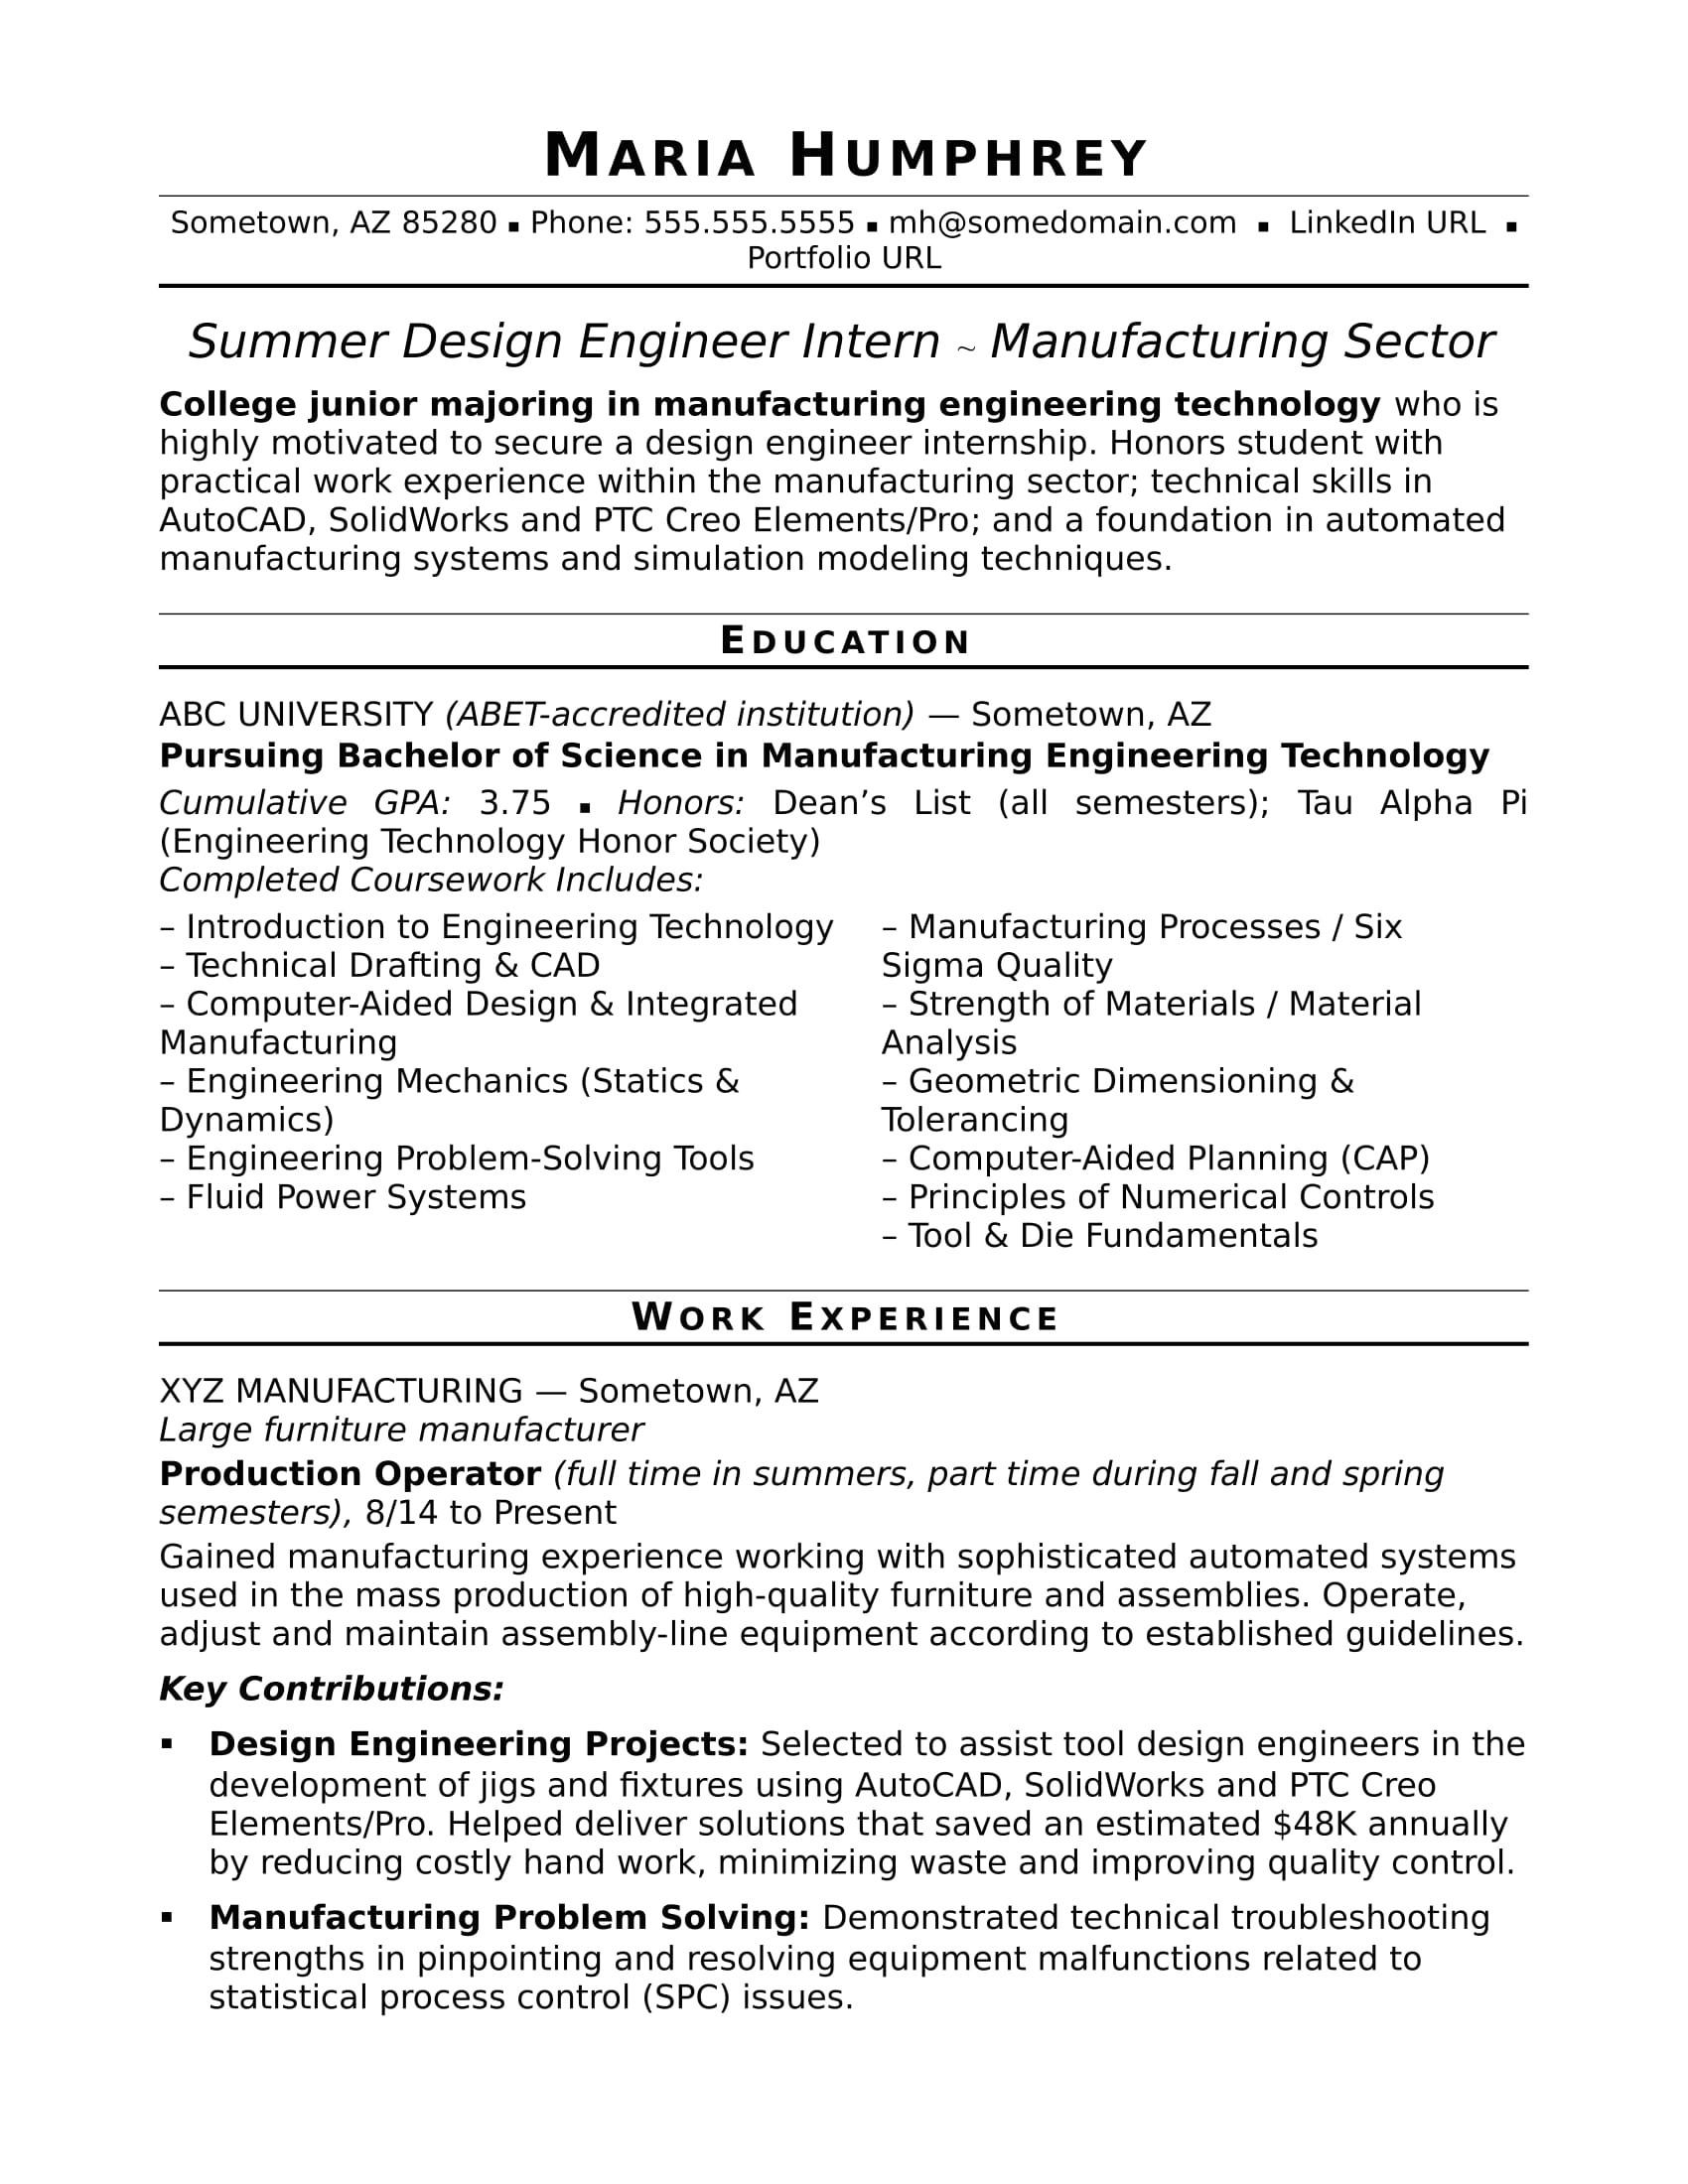 Design Engineer Resume Sample Resume for An Entry Level Design Engineer Monster Com